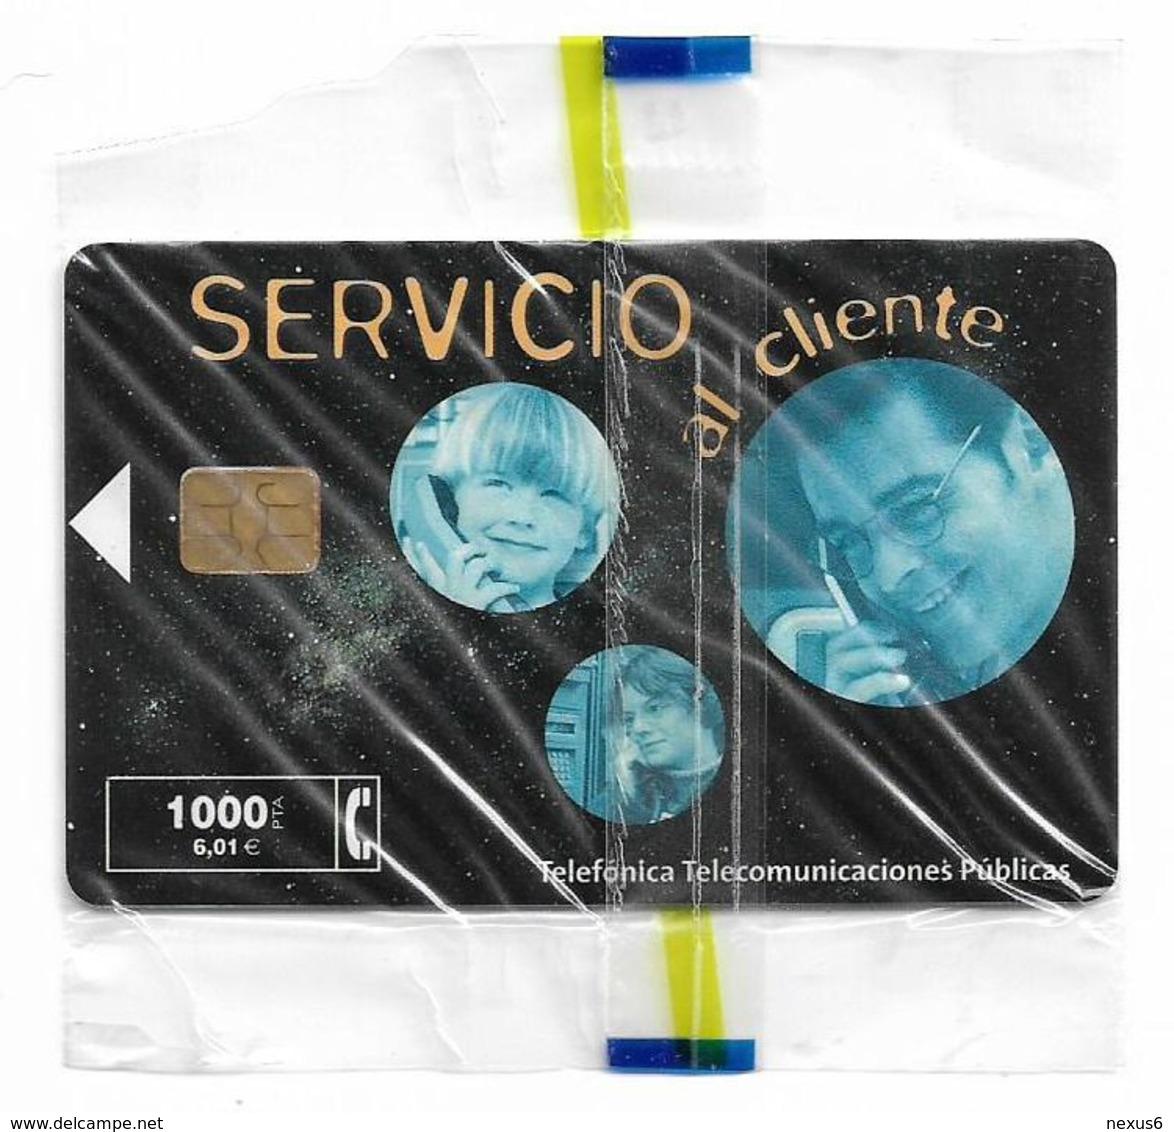 Spain - Telefonica - Servicio Al Cliente VIIIa - P-451A - 02.2001, 26.500ex, NSB - Private Issues